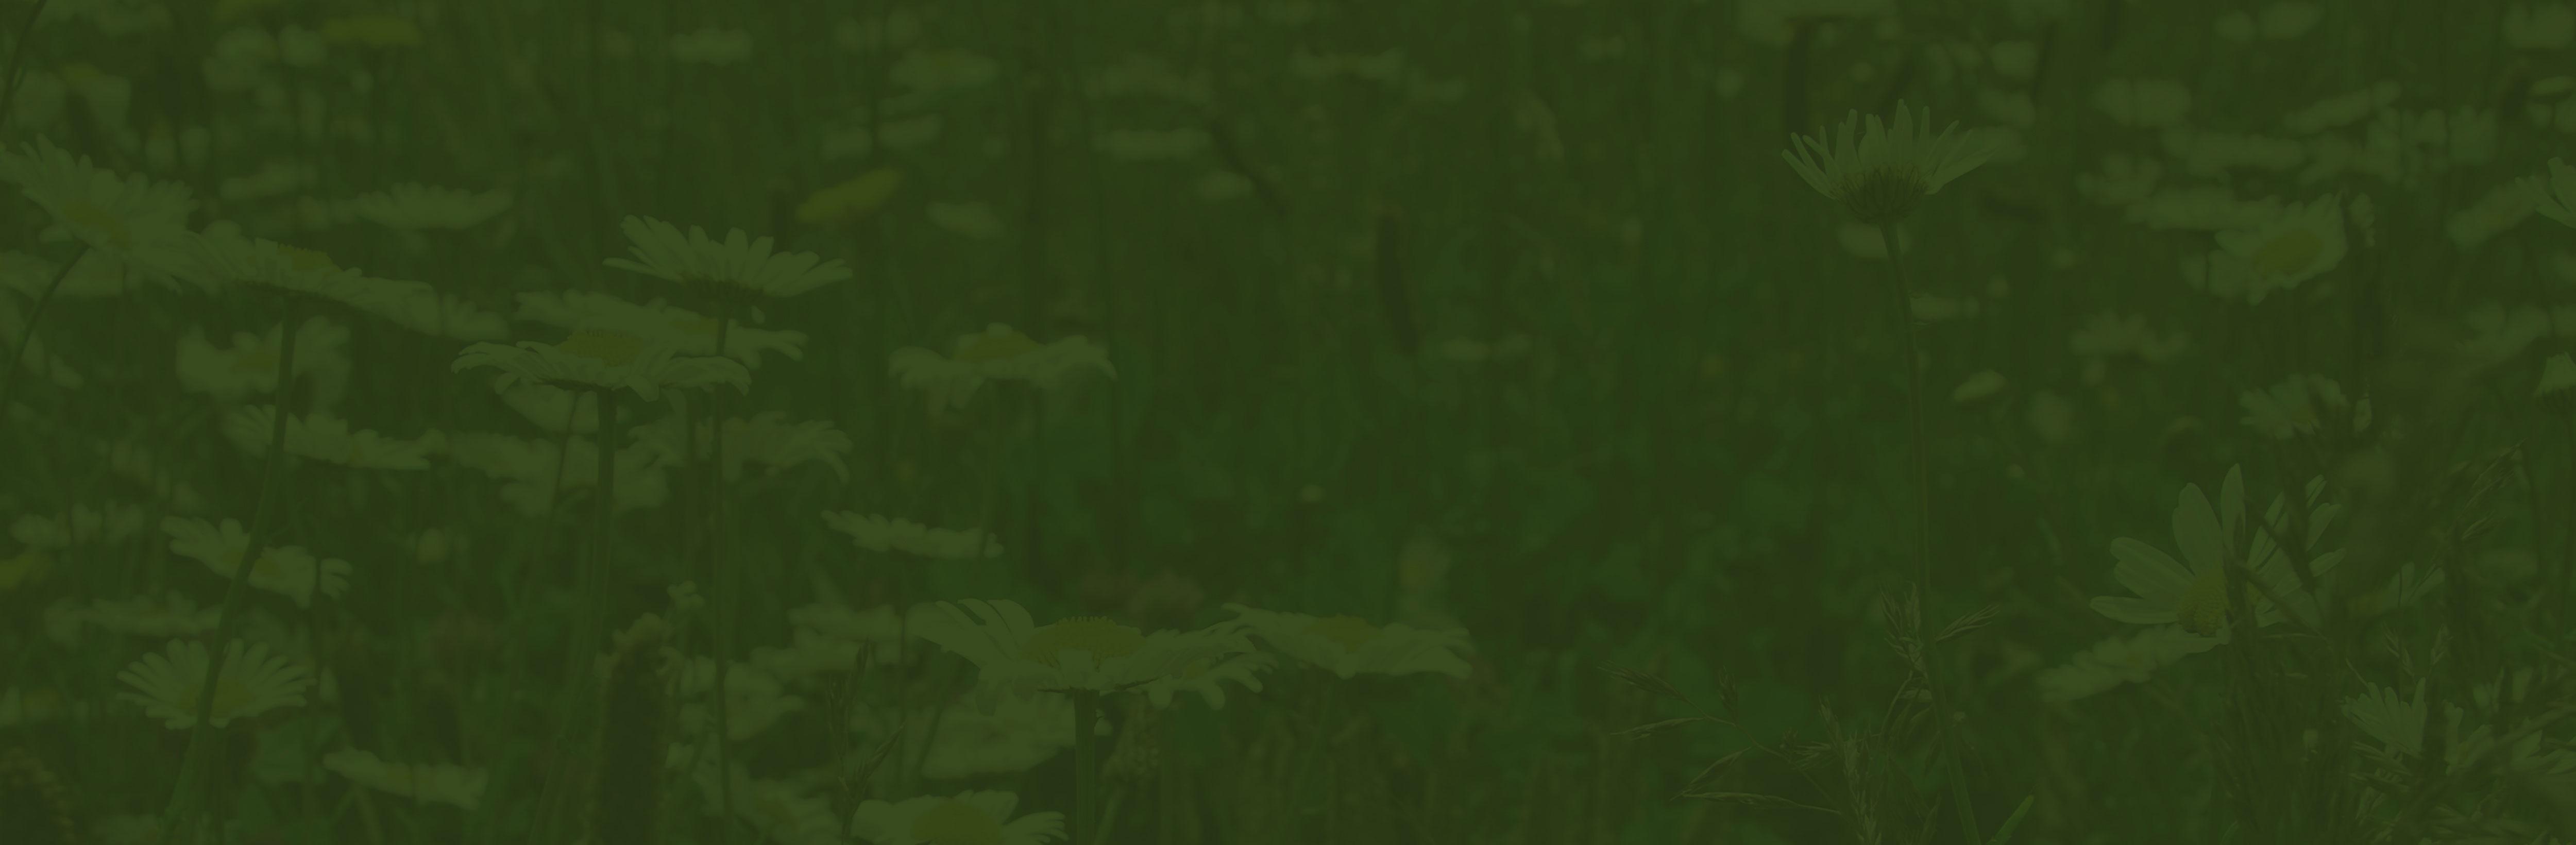 Vegetation Blankets | Roof substrates